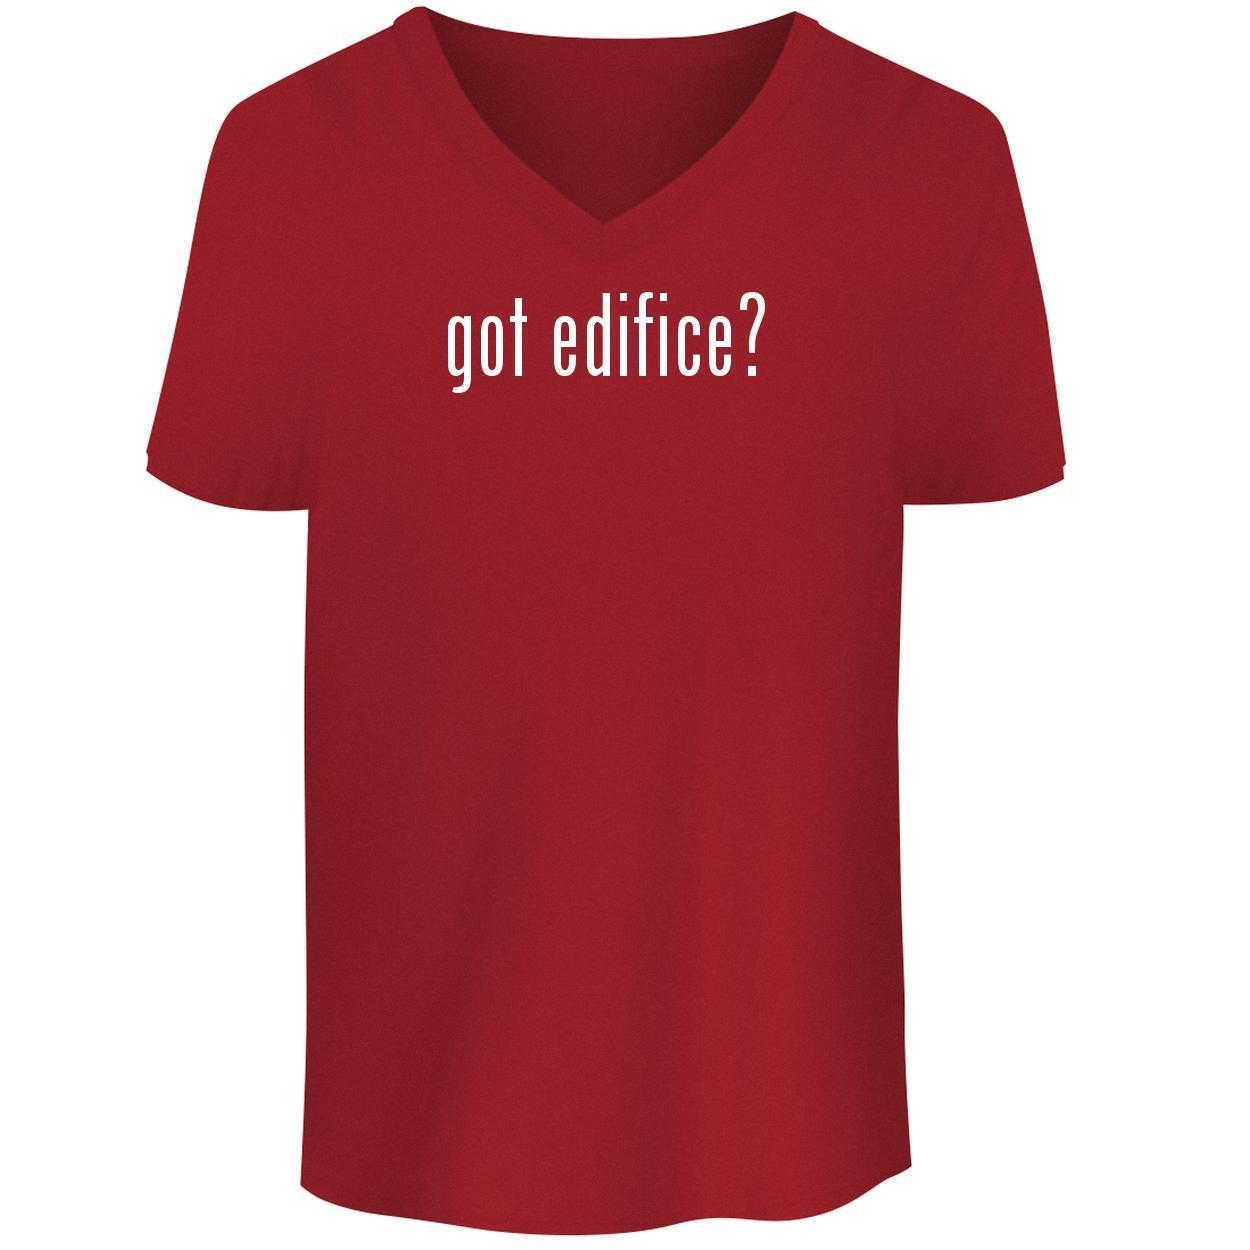 BH Cool Designs got Edifice? - Men's V Neck Graphic Tee, Red, Small